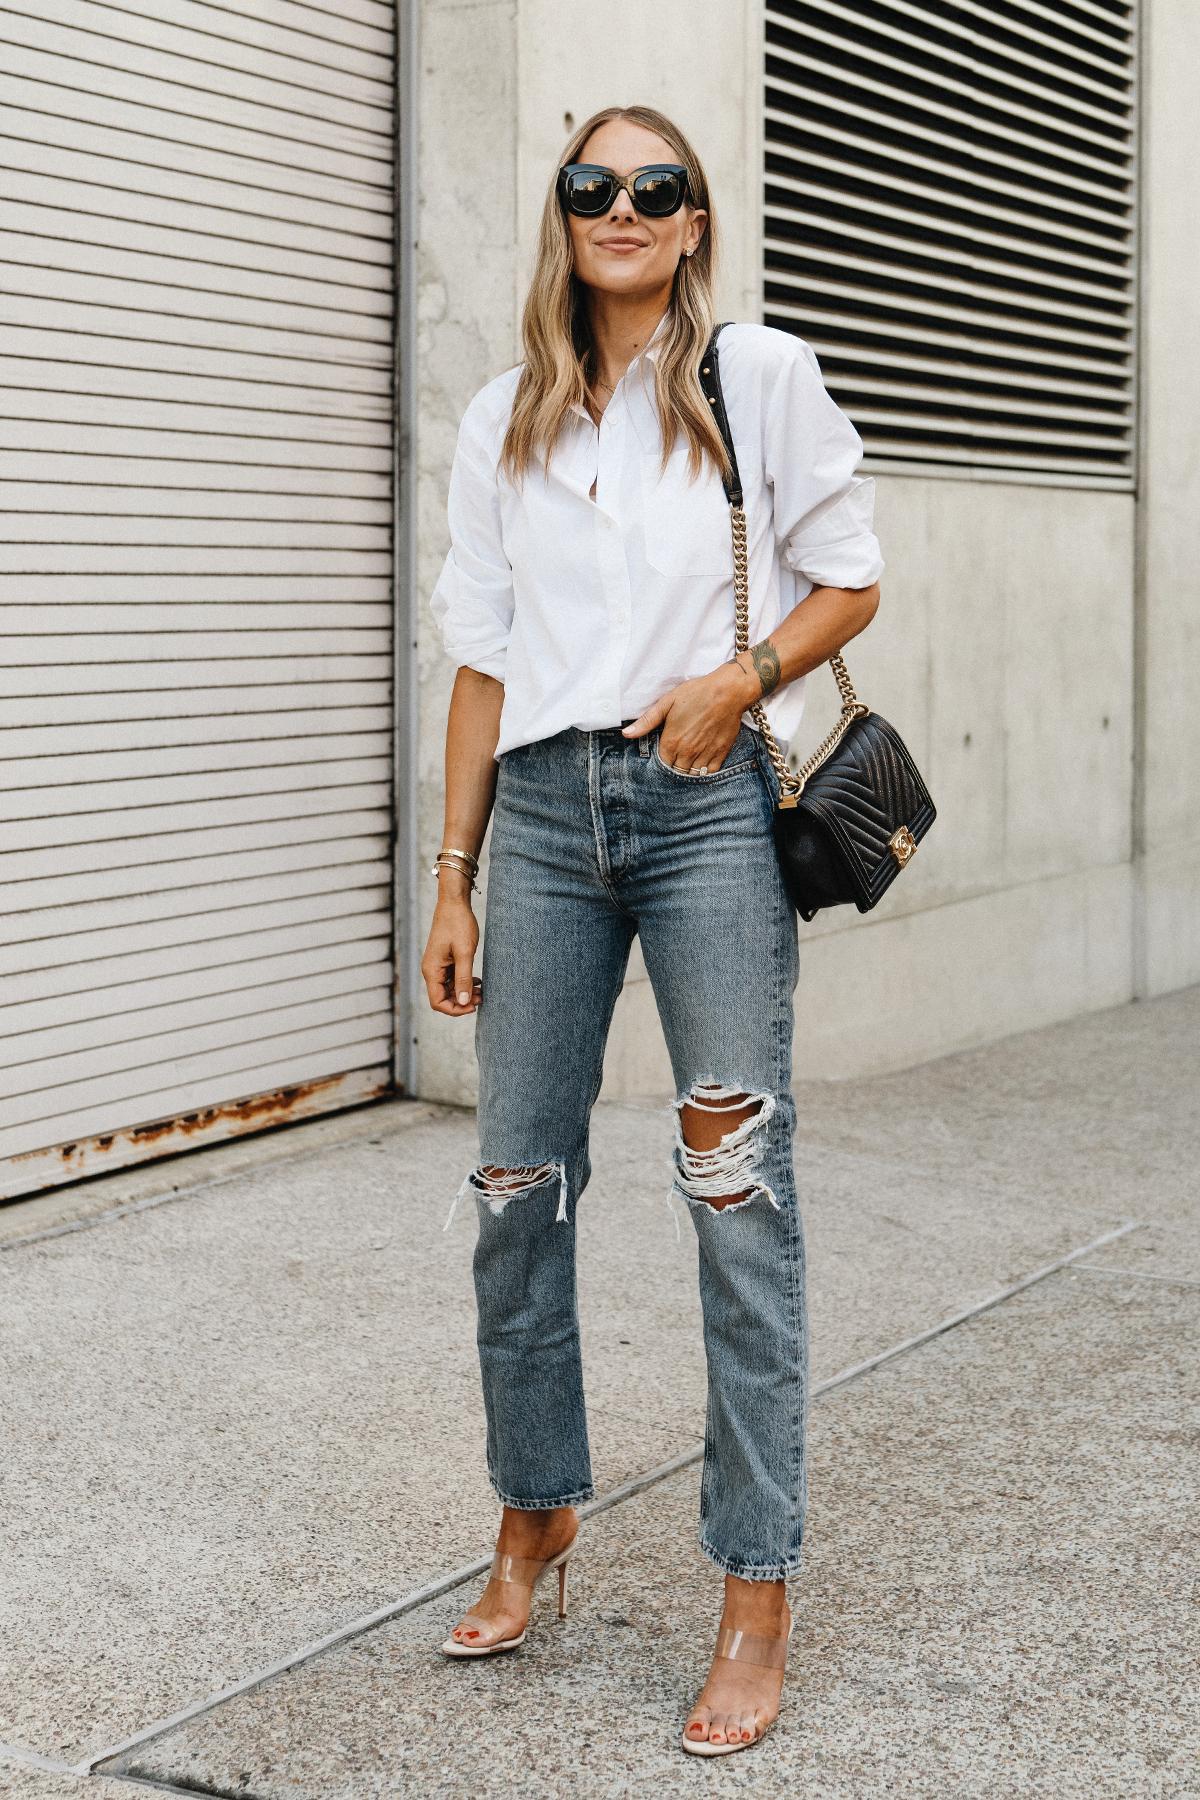 Fashion Jackson Wearing Jenni Kayne White Button Up Shirt AGOLDE Ripped Jeans Chanel Black Boy Bag Schutz Clear Heeled Sandals Street Style